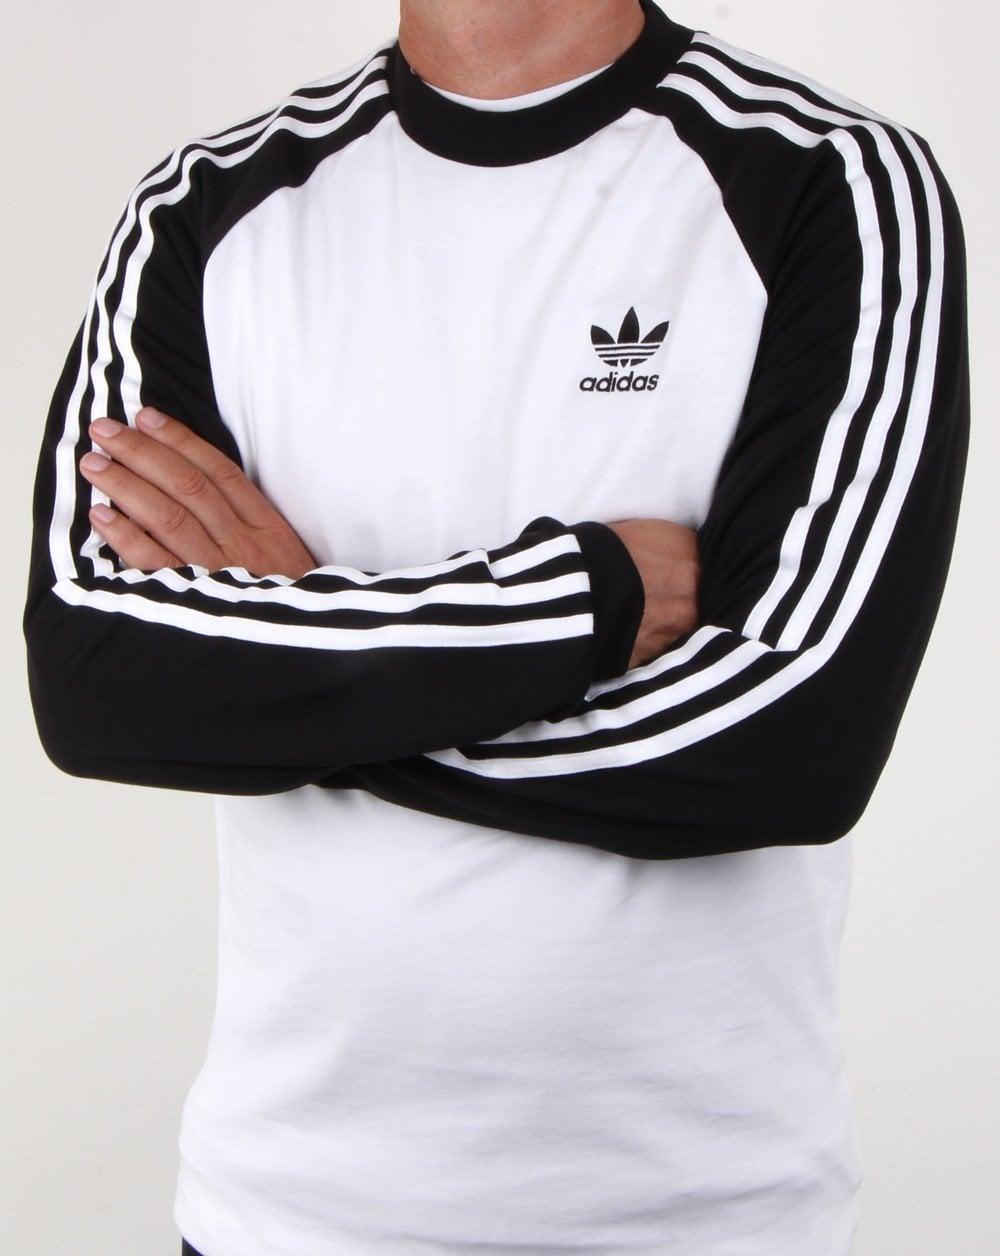 28ad3627171d Adidas Originals 3 Stripes Long Sleeve T Shirt White black